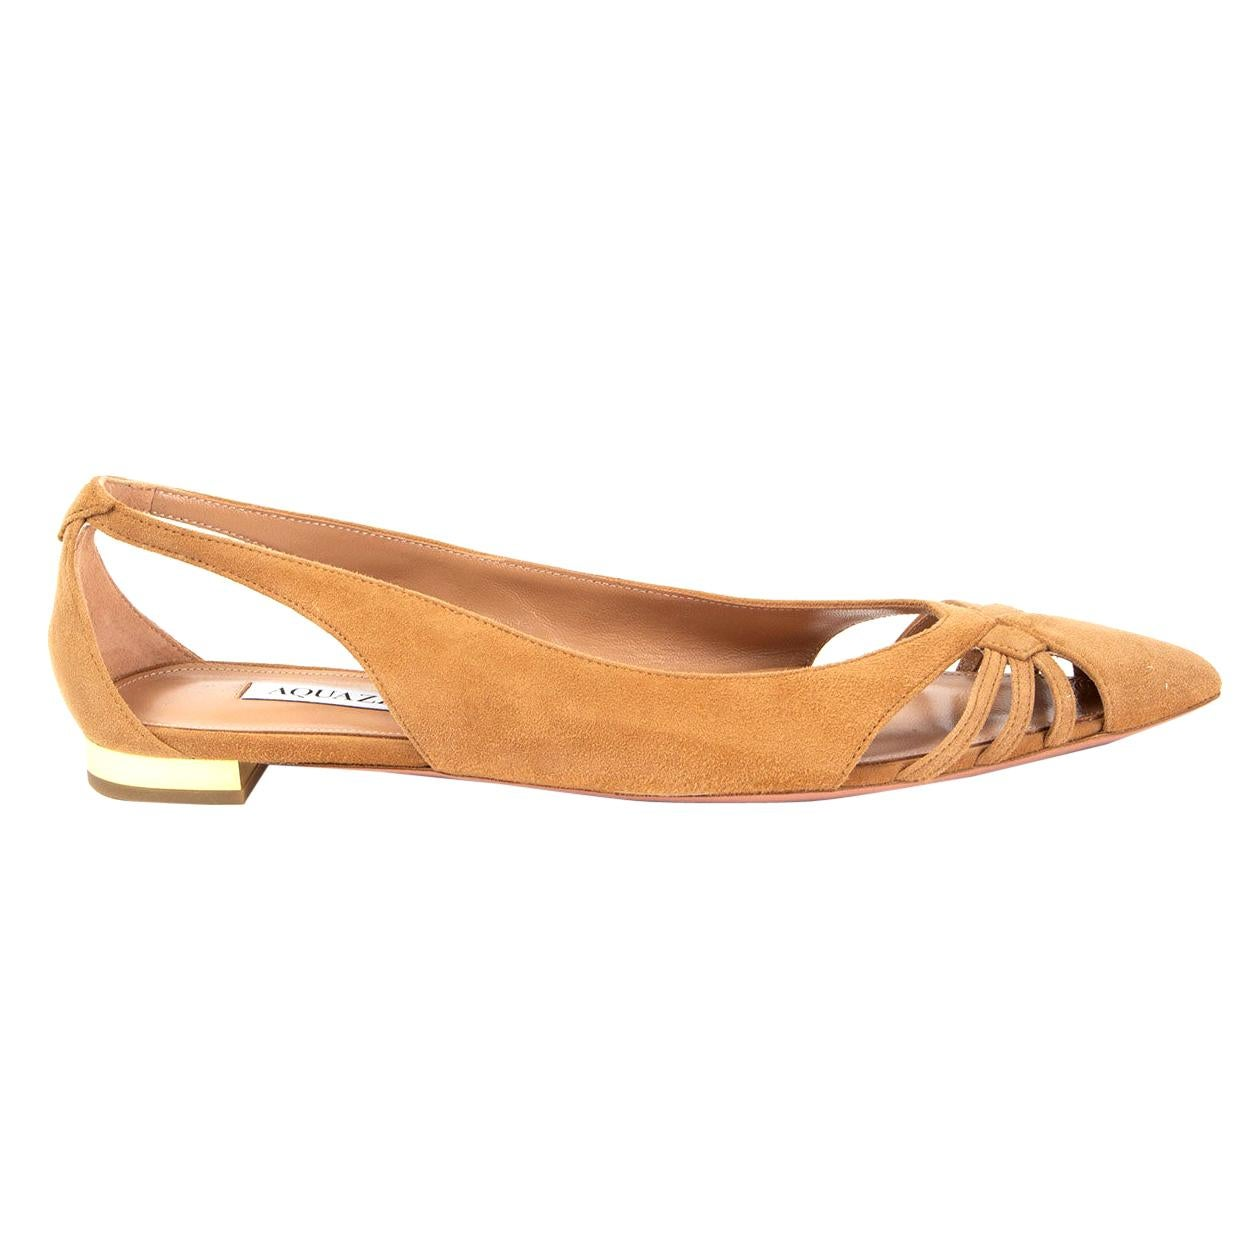 AQUAZZURA beige suede CECE Ballet Flats Shoes 38